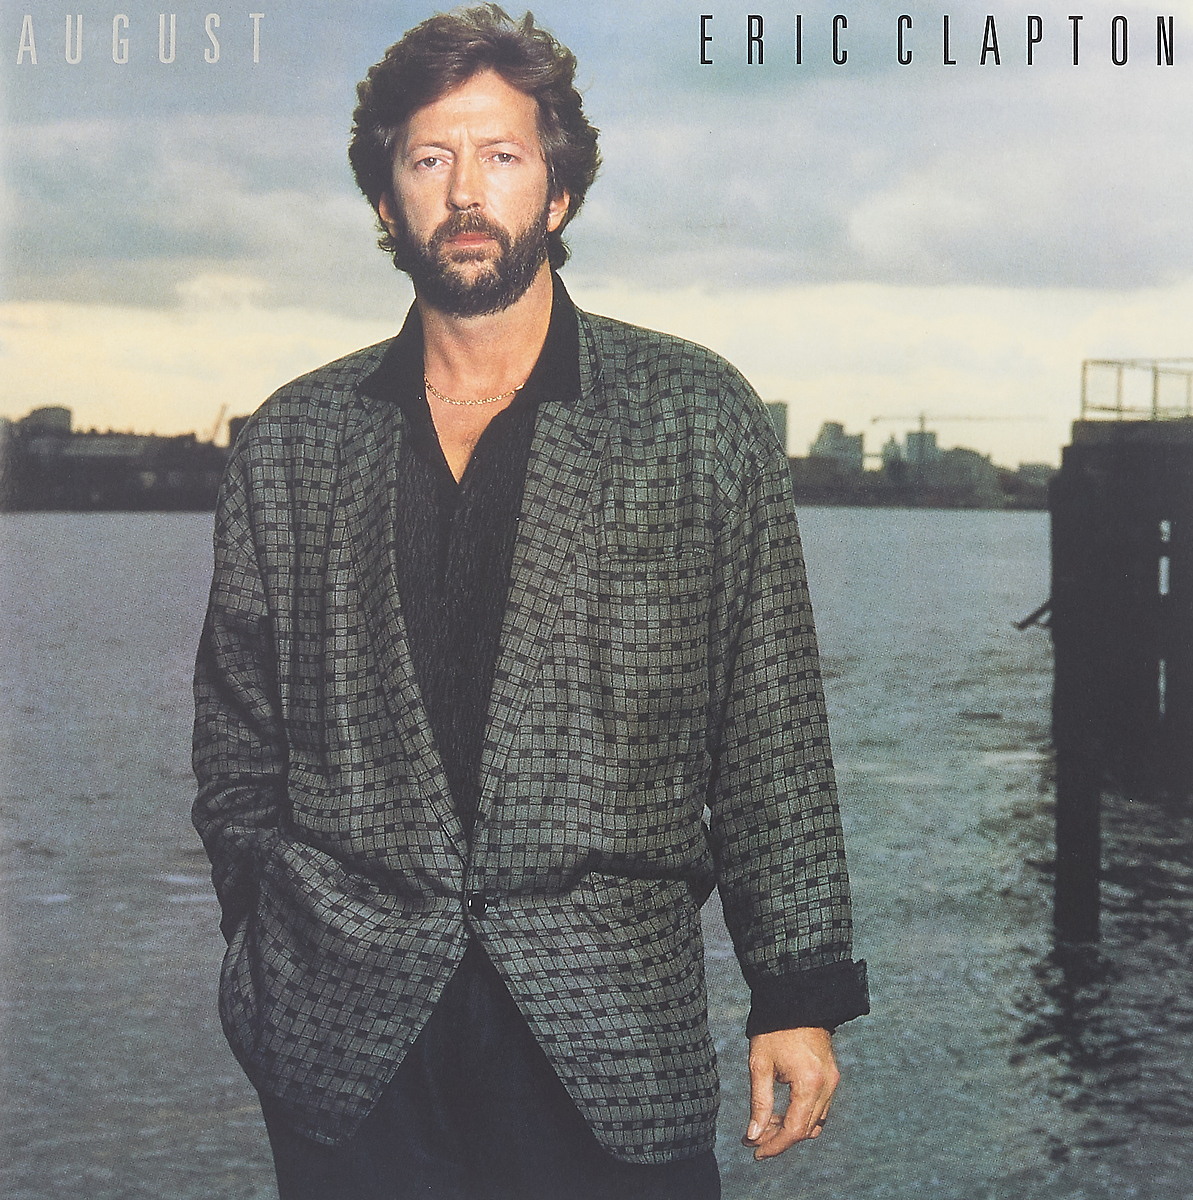 Эрик Клэптон Eric Clapton. August (LP) эрик клэптон eric clapton slowhand 35th anniversary edition lp